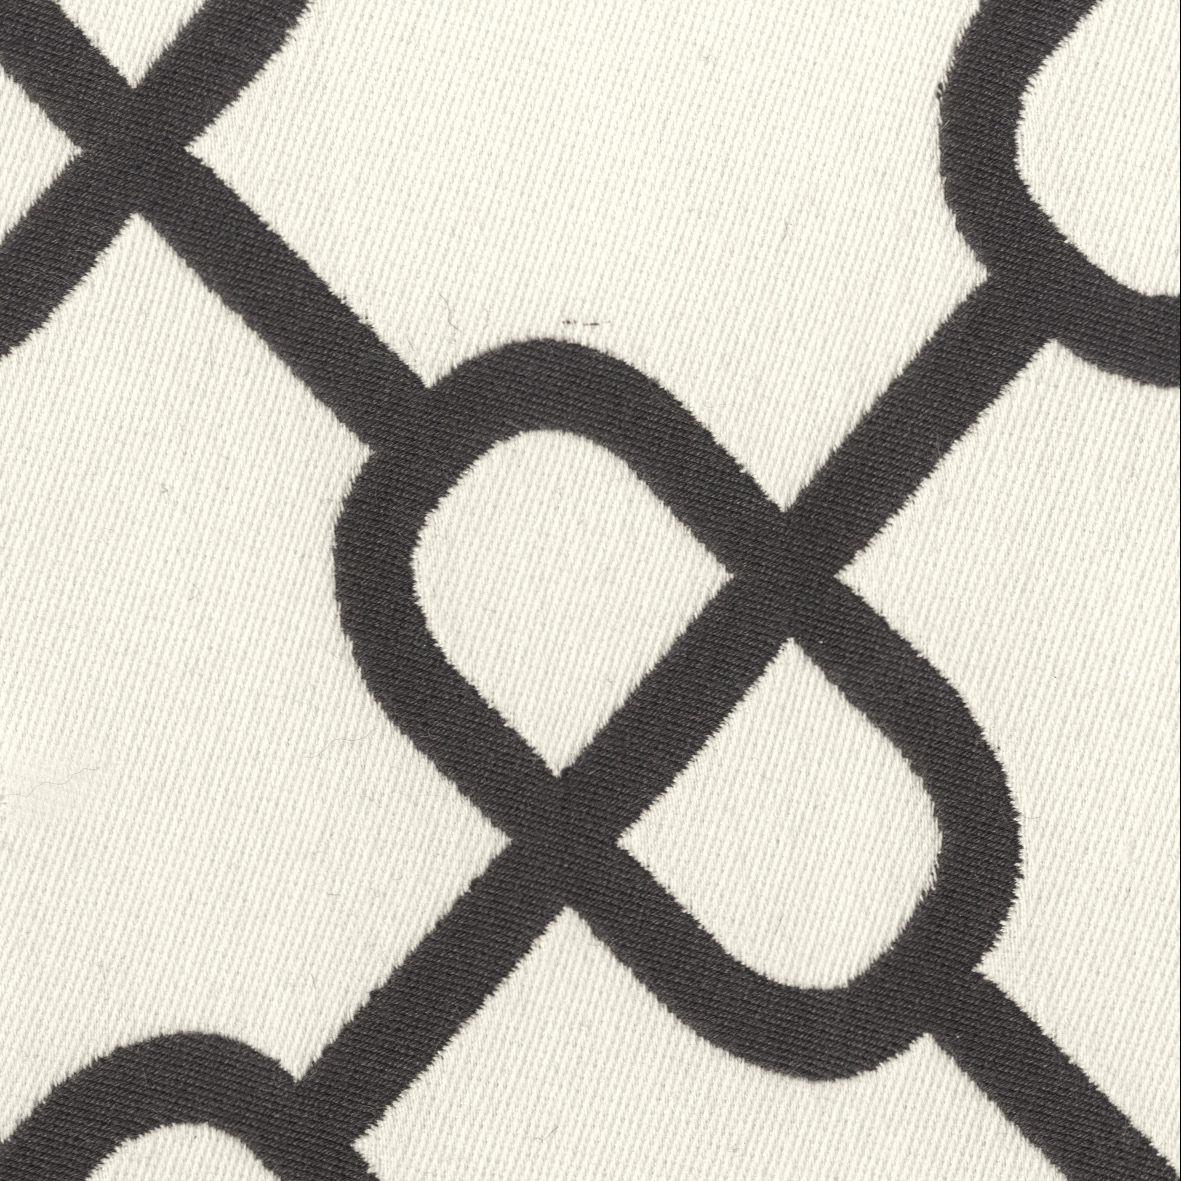 Bianco/Antracite